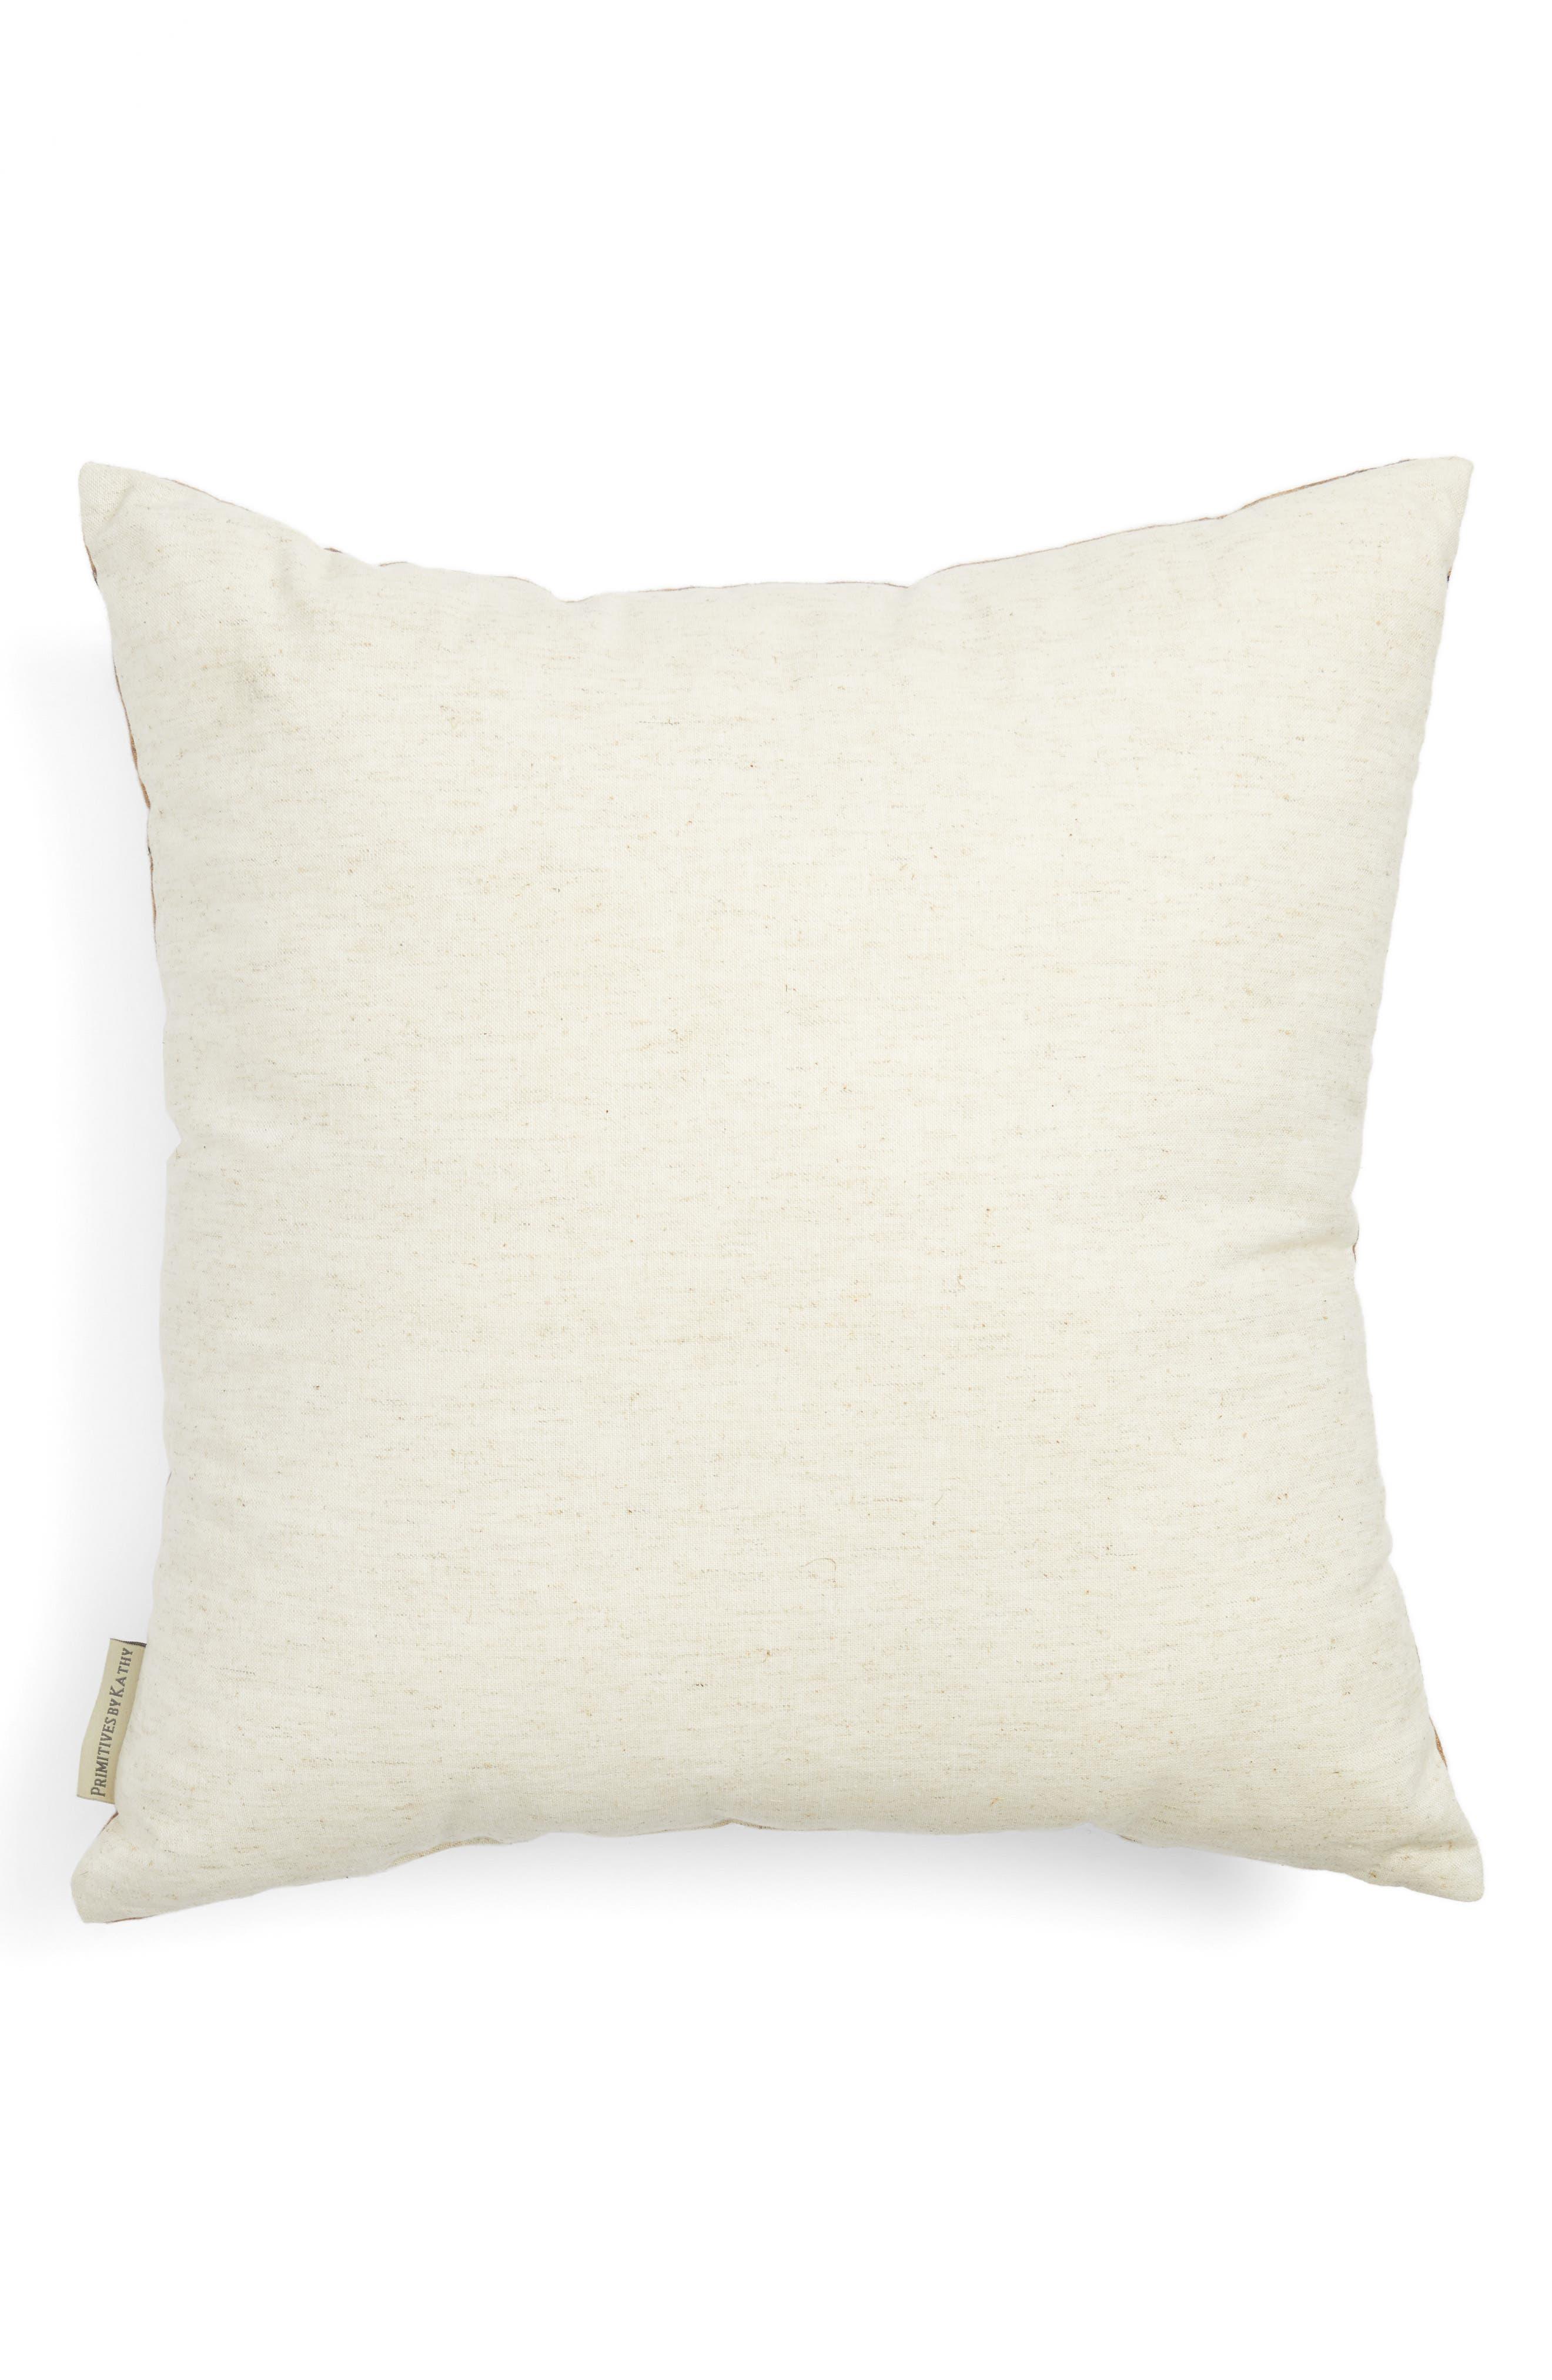 Silent Night Pillow,                             Alternate thumbnail 2, color,                             Ivory